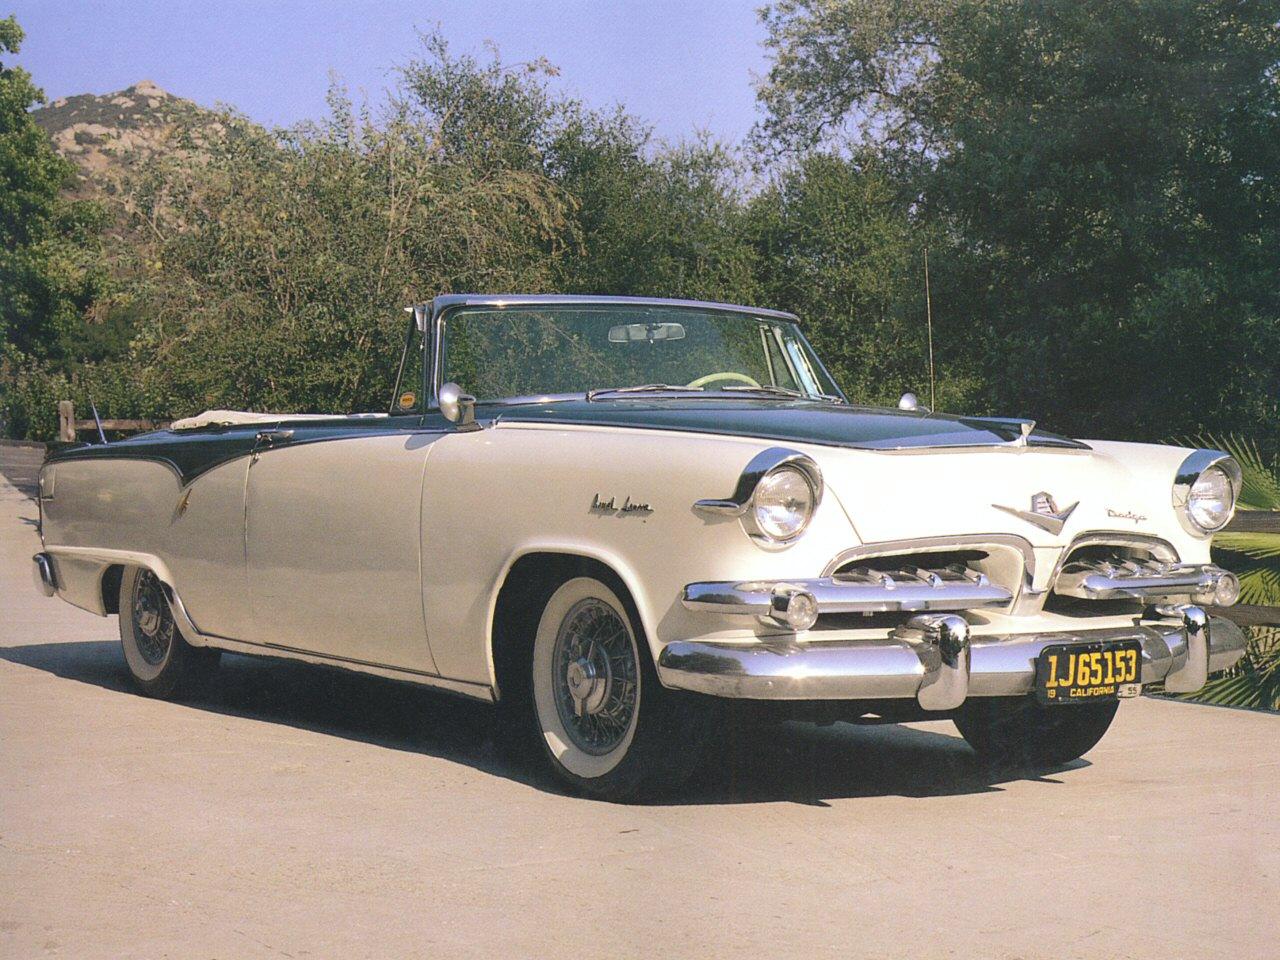 1955 dodge royal lancer convertible cream black fvr cars - 1955 Dodge Royal Lancer Convertible Cream Black Fvr Next Cars Wallpaper